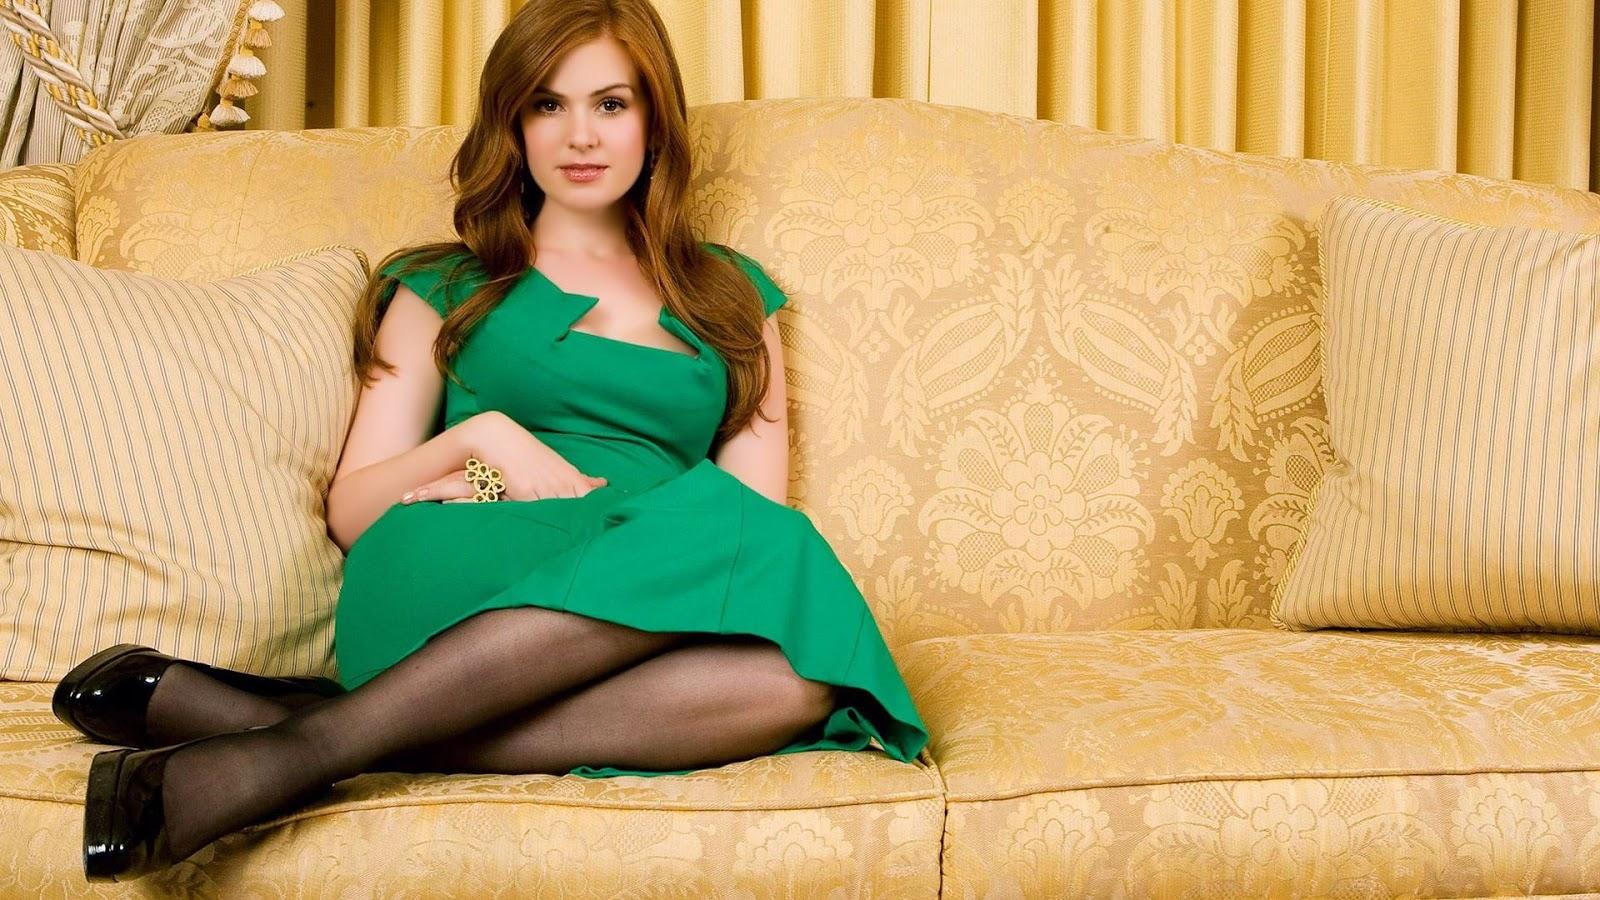 Ravishment Isla Fisher Australian Actress Hd Wallpapers